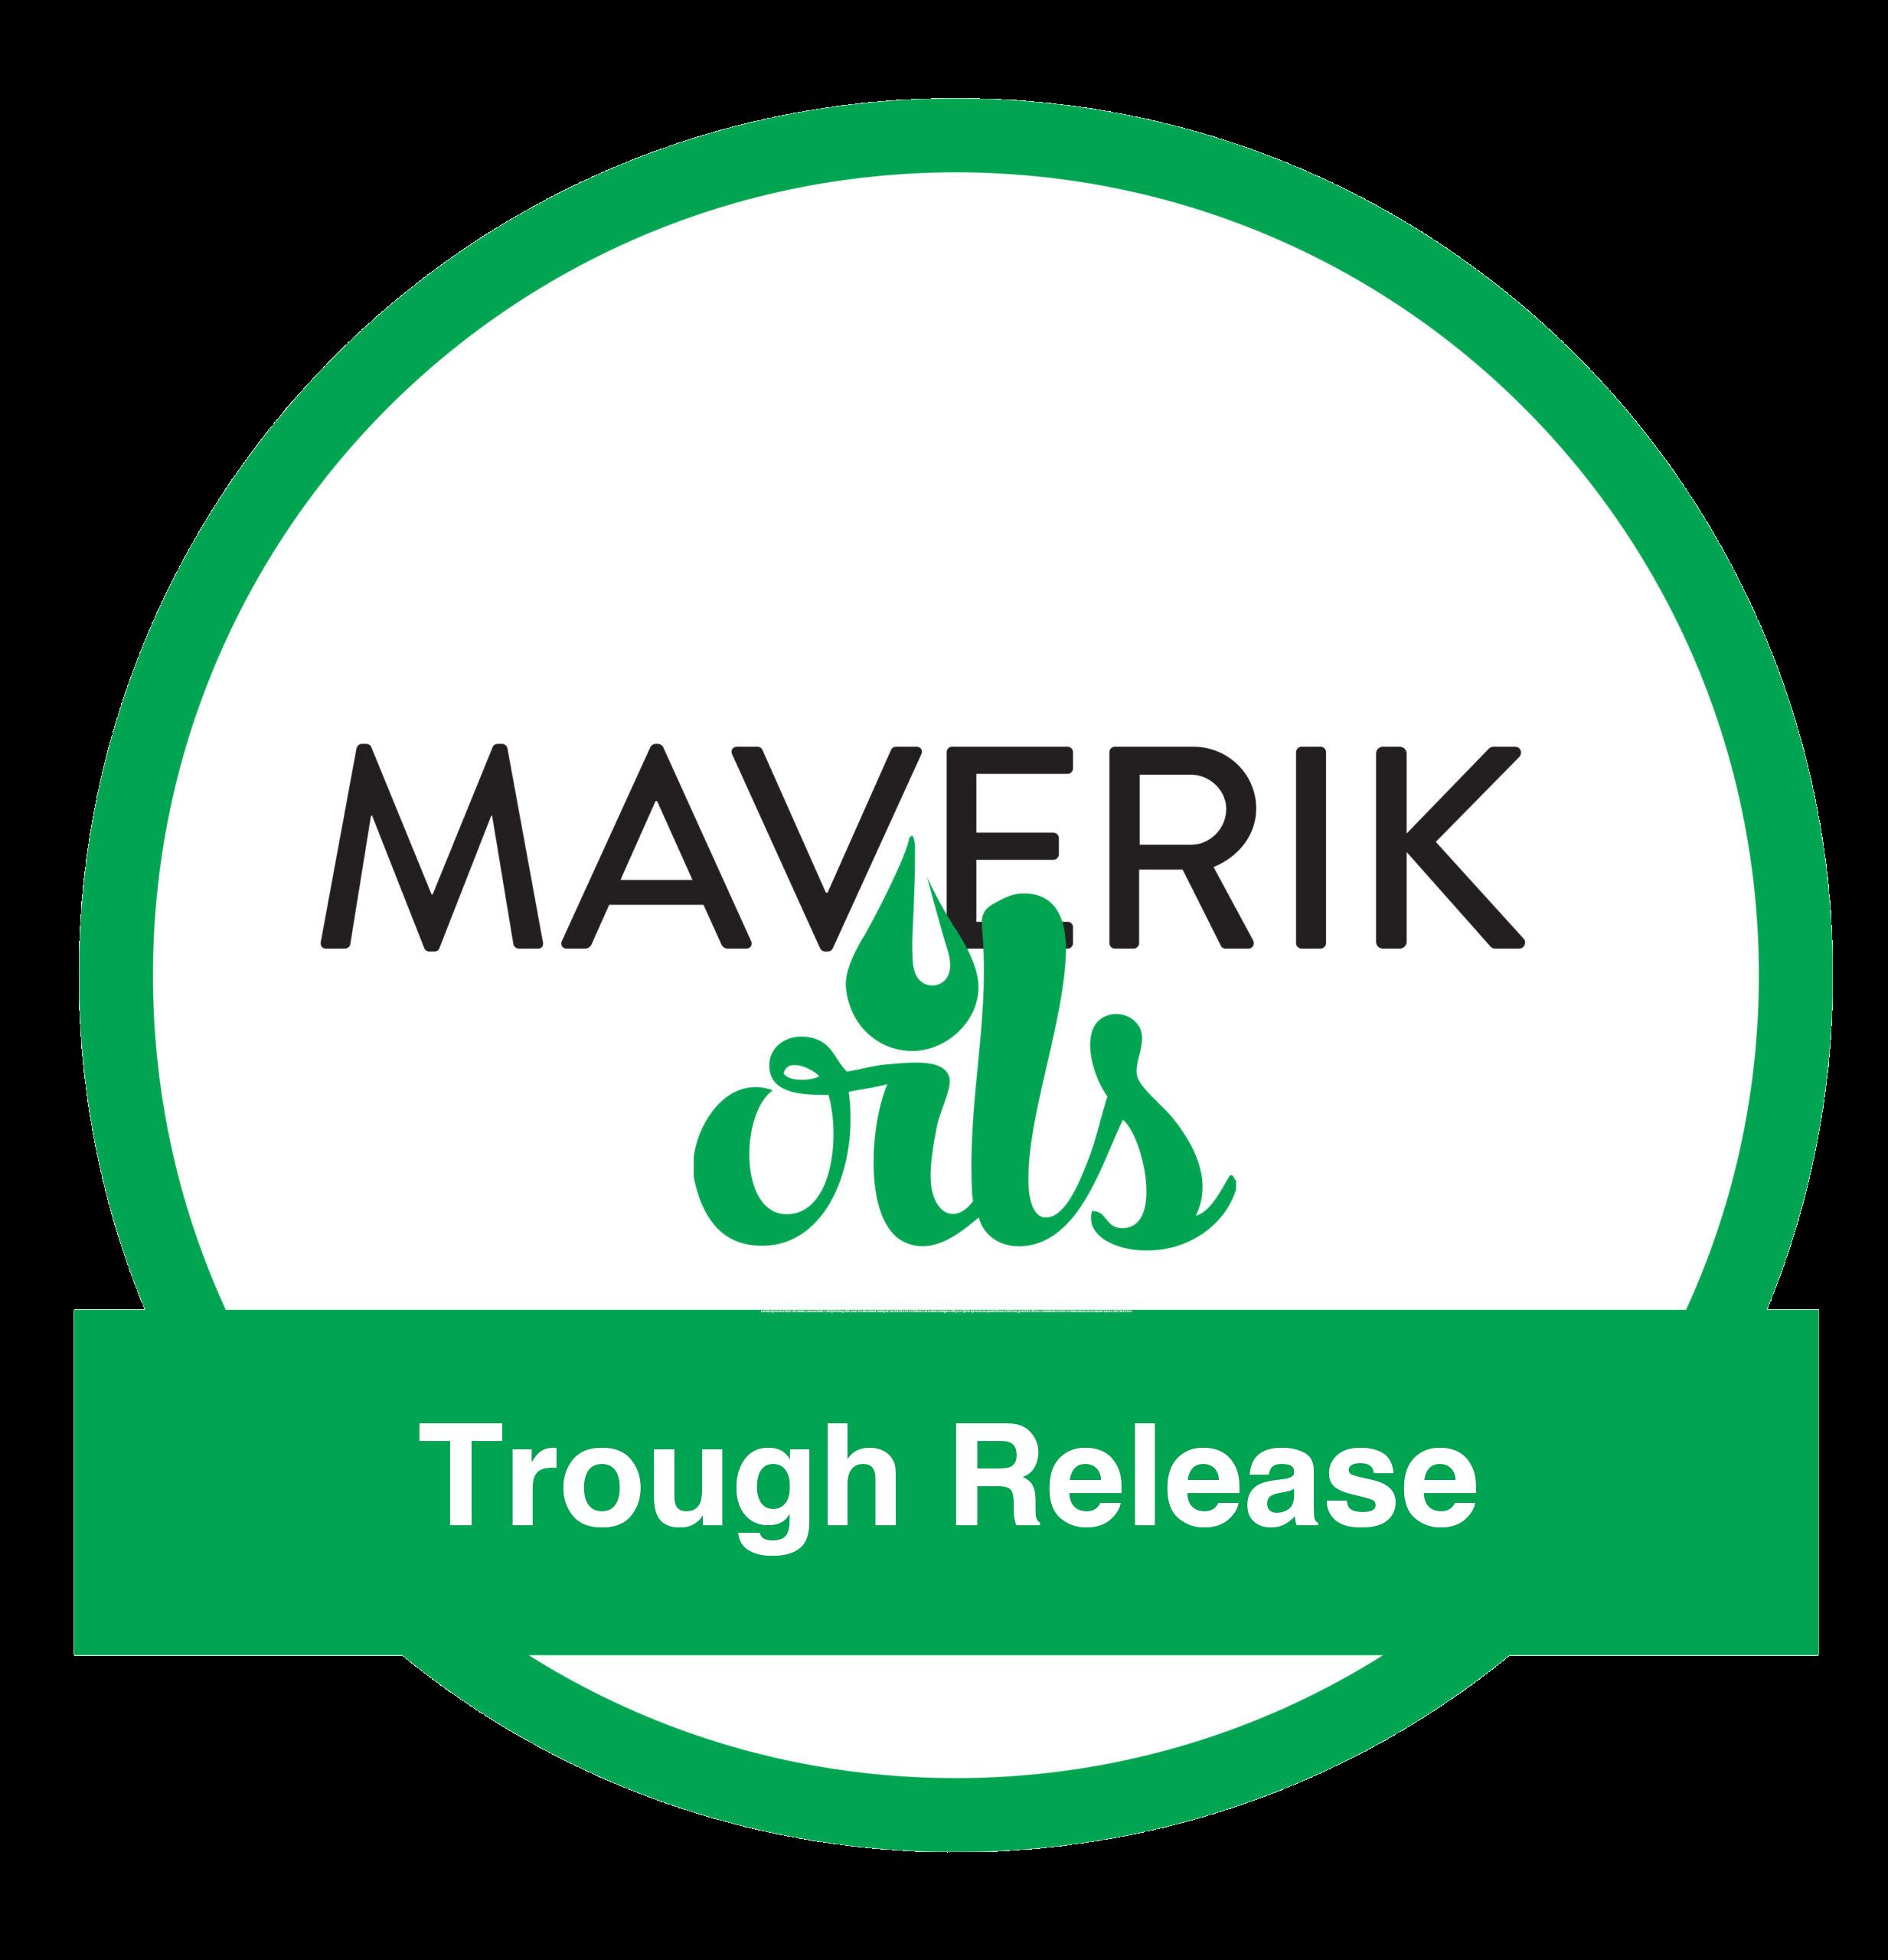 Trough Release